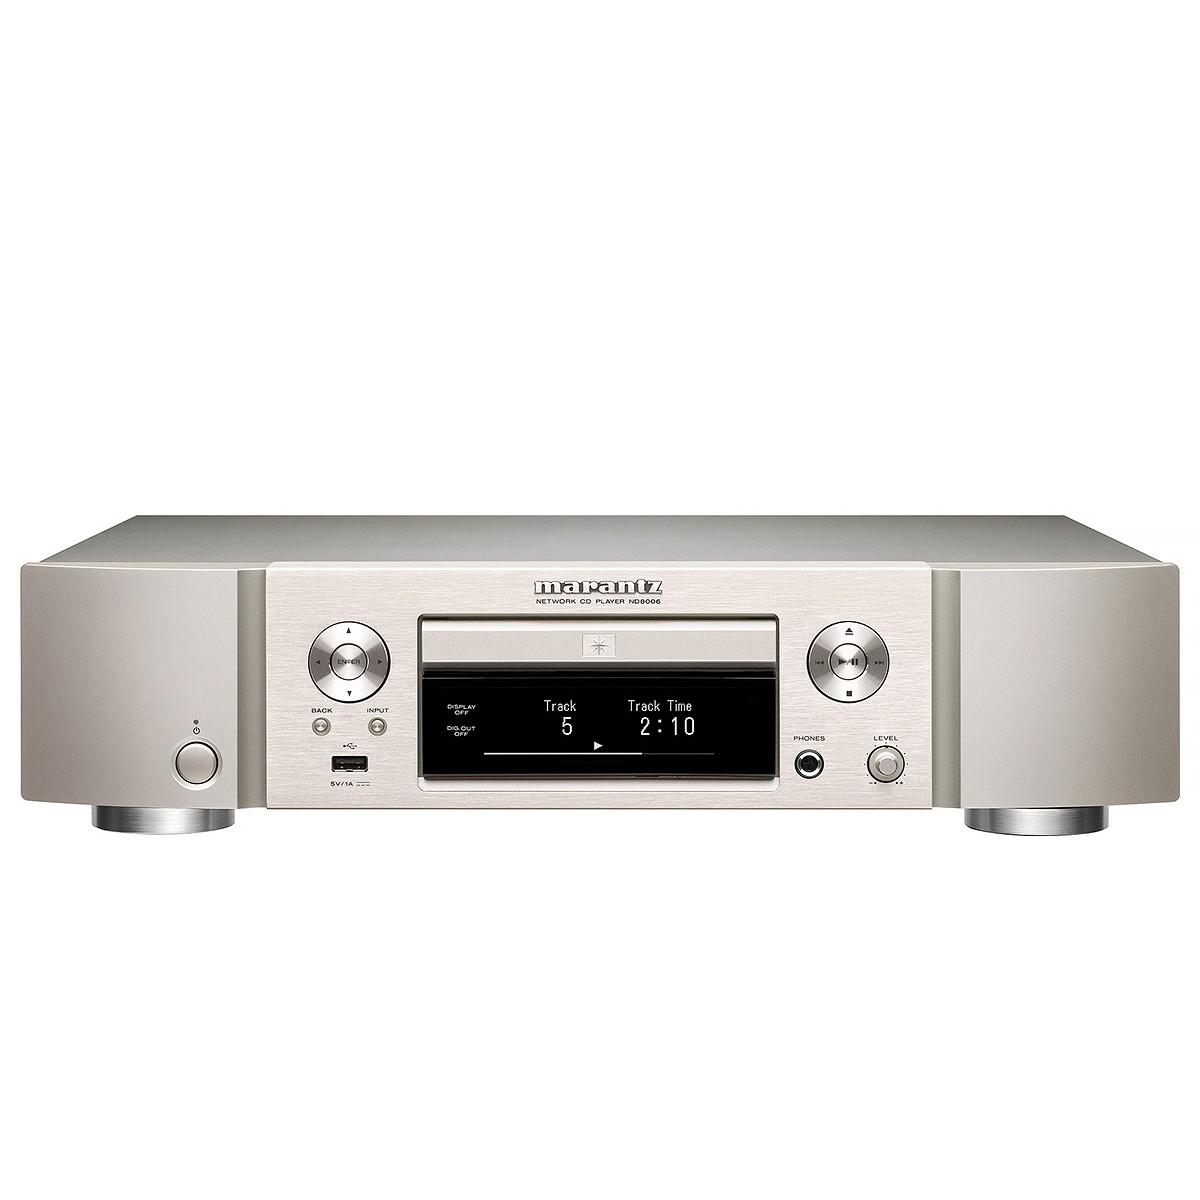 Hálózati CD Lejátszó DAC-Mode-dal ND8006